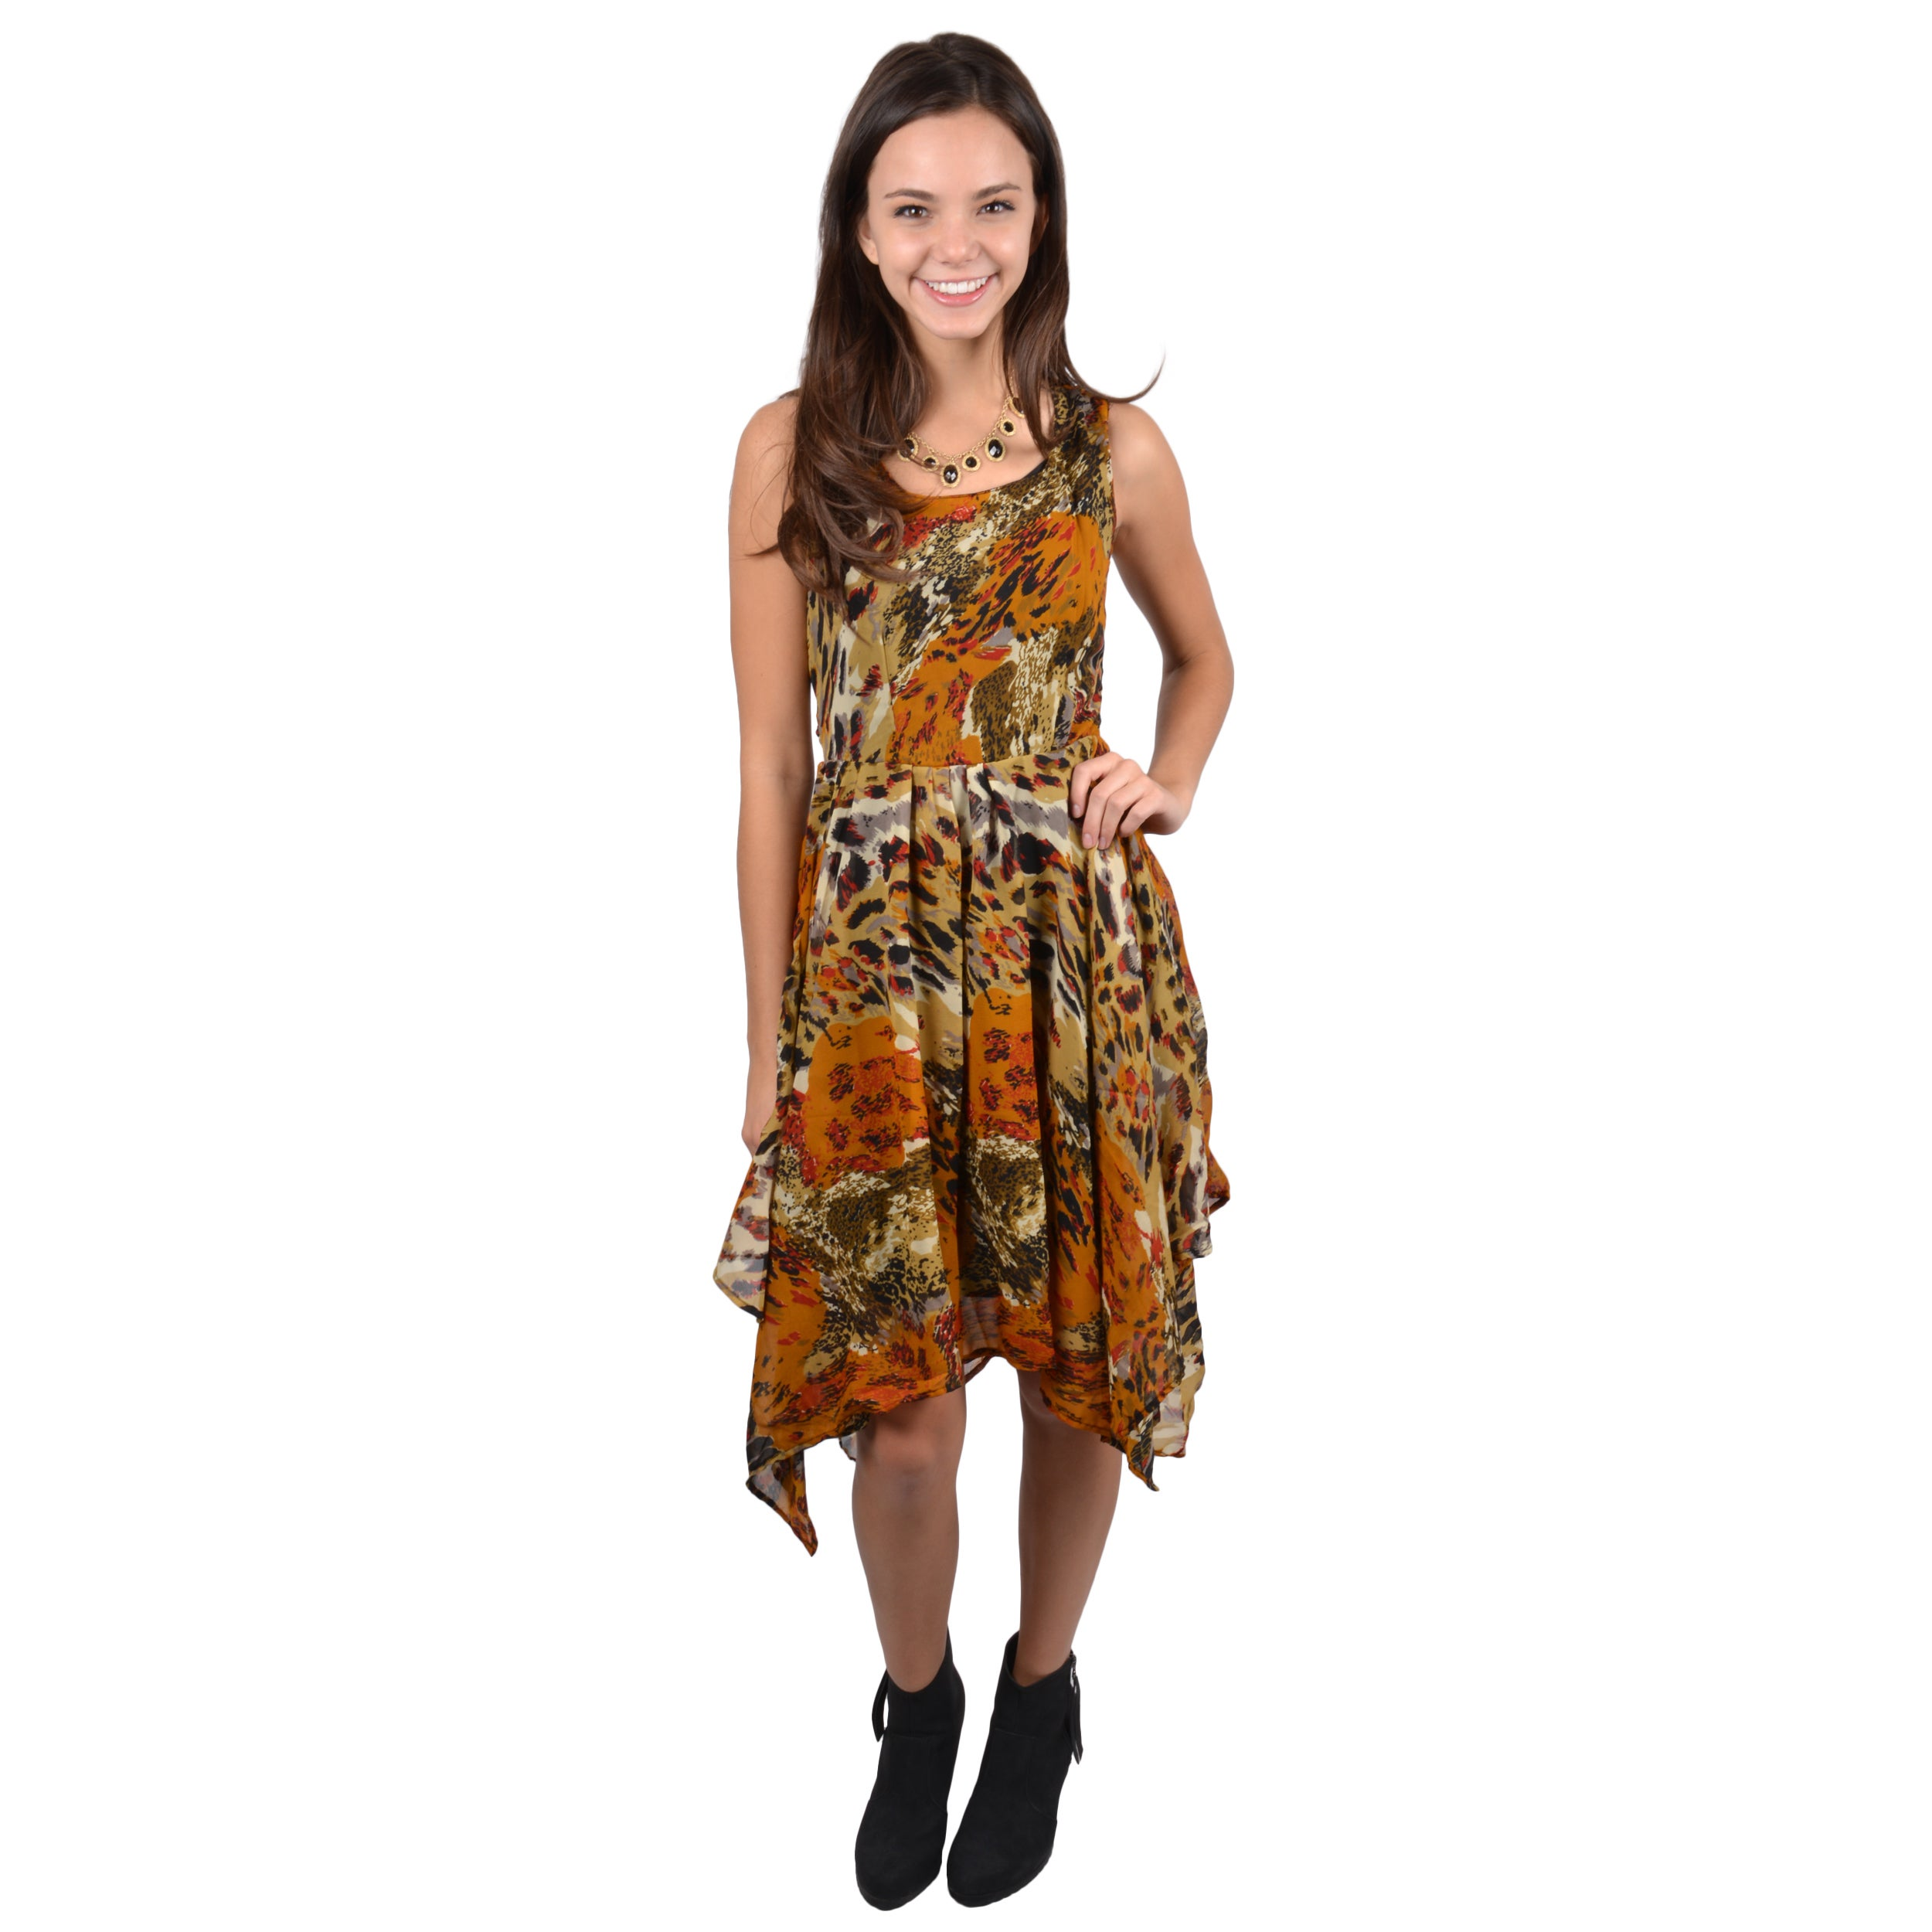 Journee Collection Women's Asymetrical Hem Sleeveless Dress at Sears.com